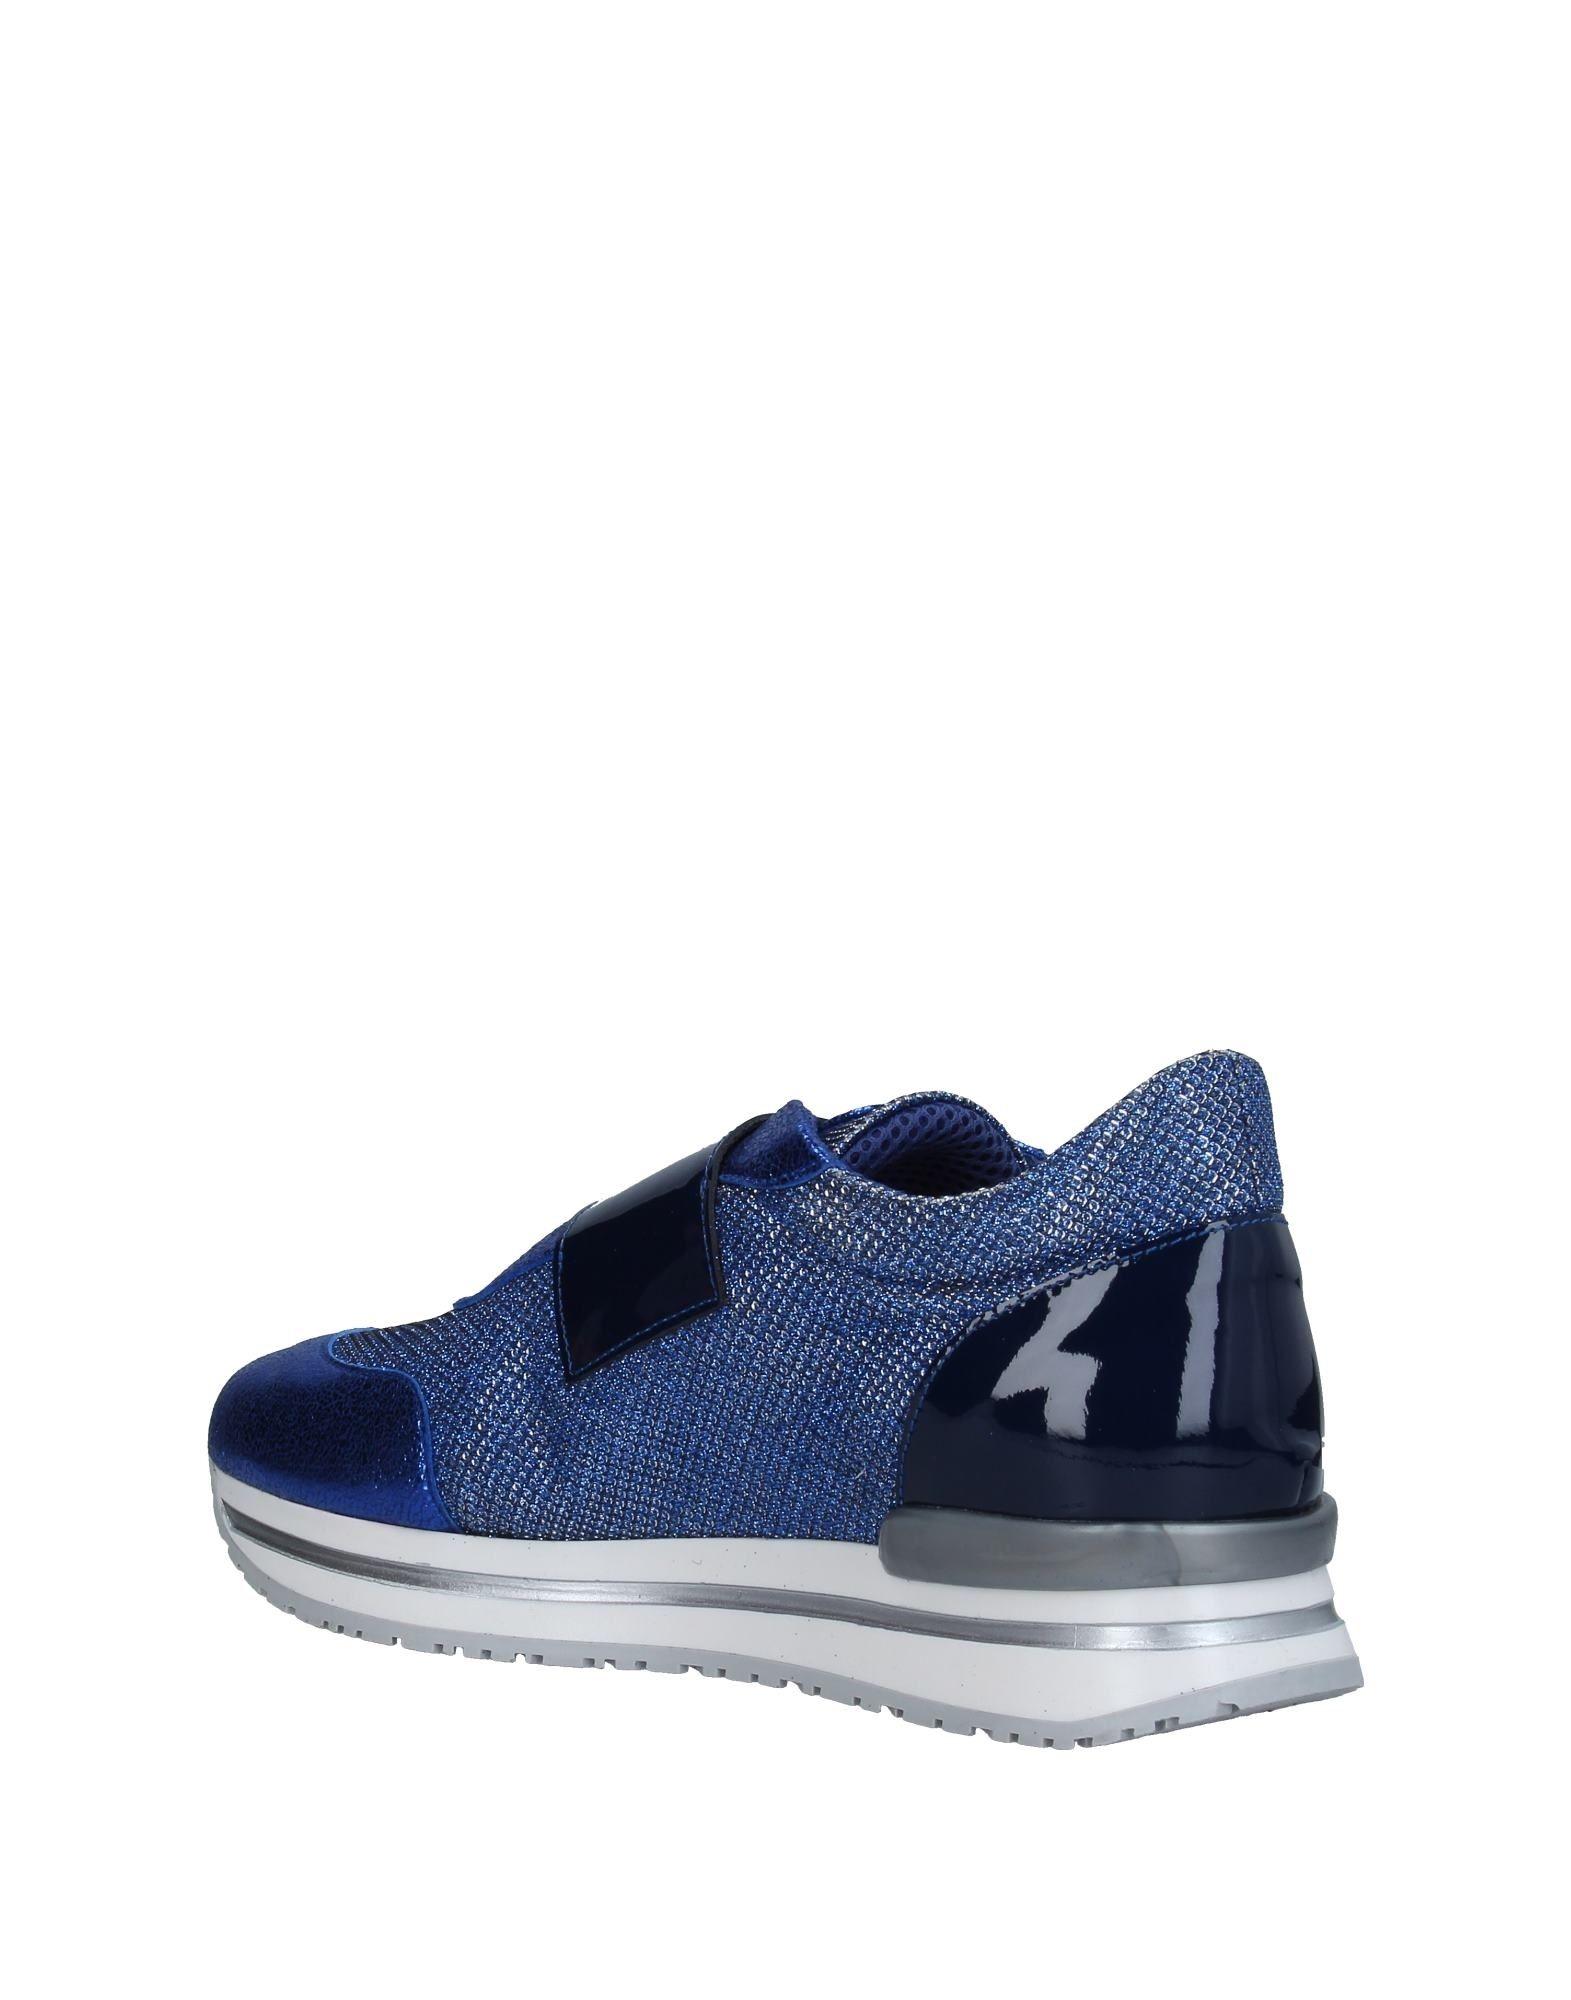 Giancarlo Paoli Sneakers Damen  11336841FI Gute Qualität beliebte Schuhe